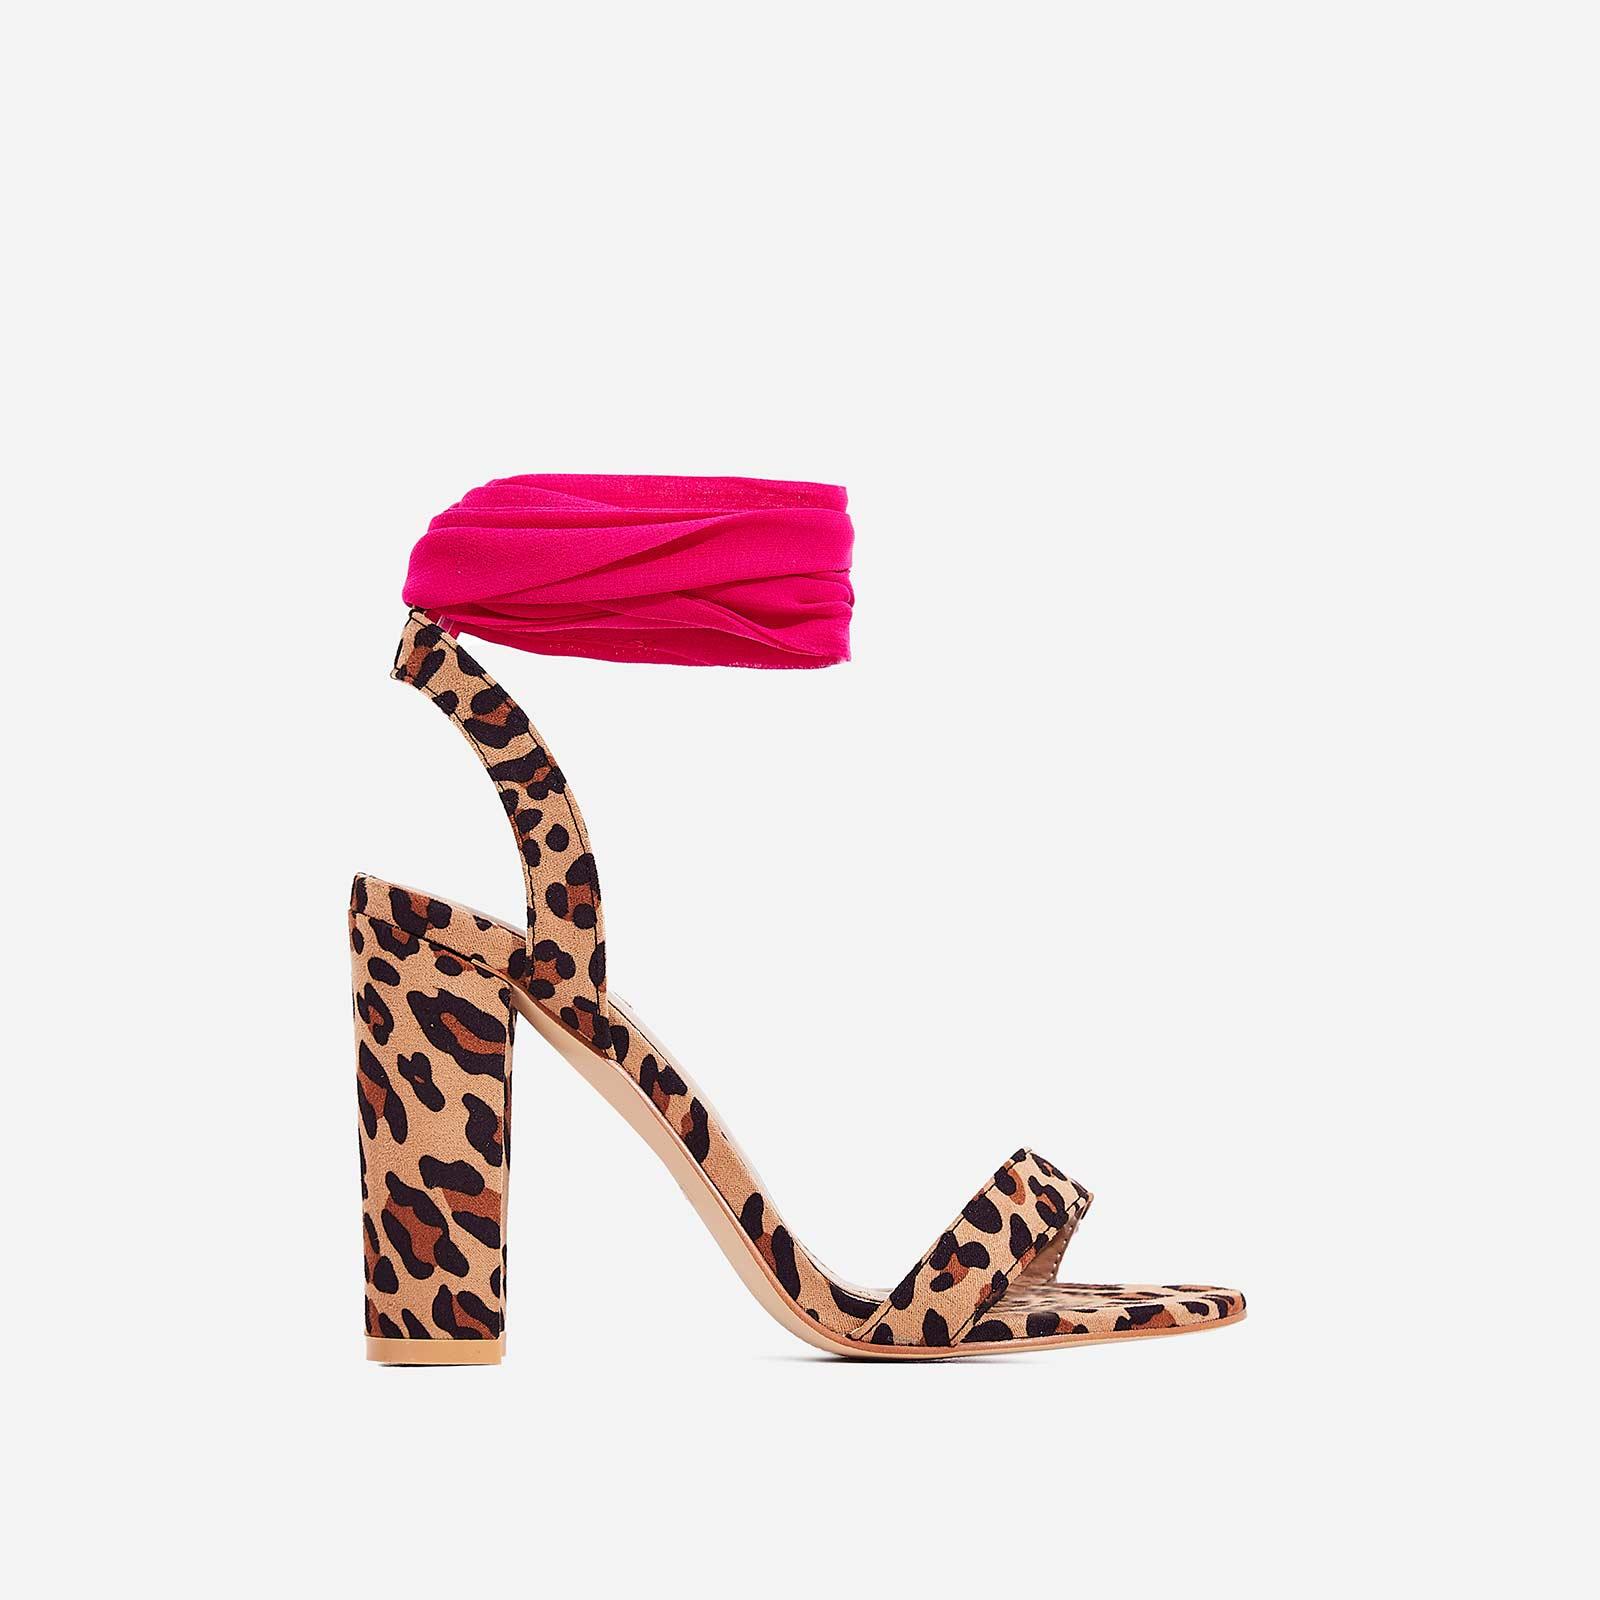 Milan Ribbon Lace Up Block Heel In Tan Leopard Print Faux Suede